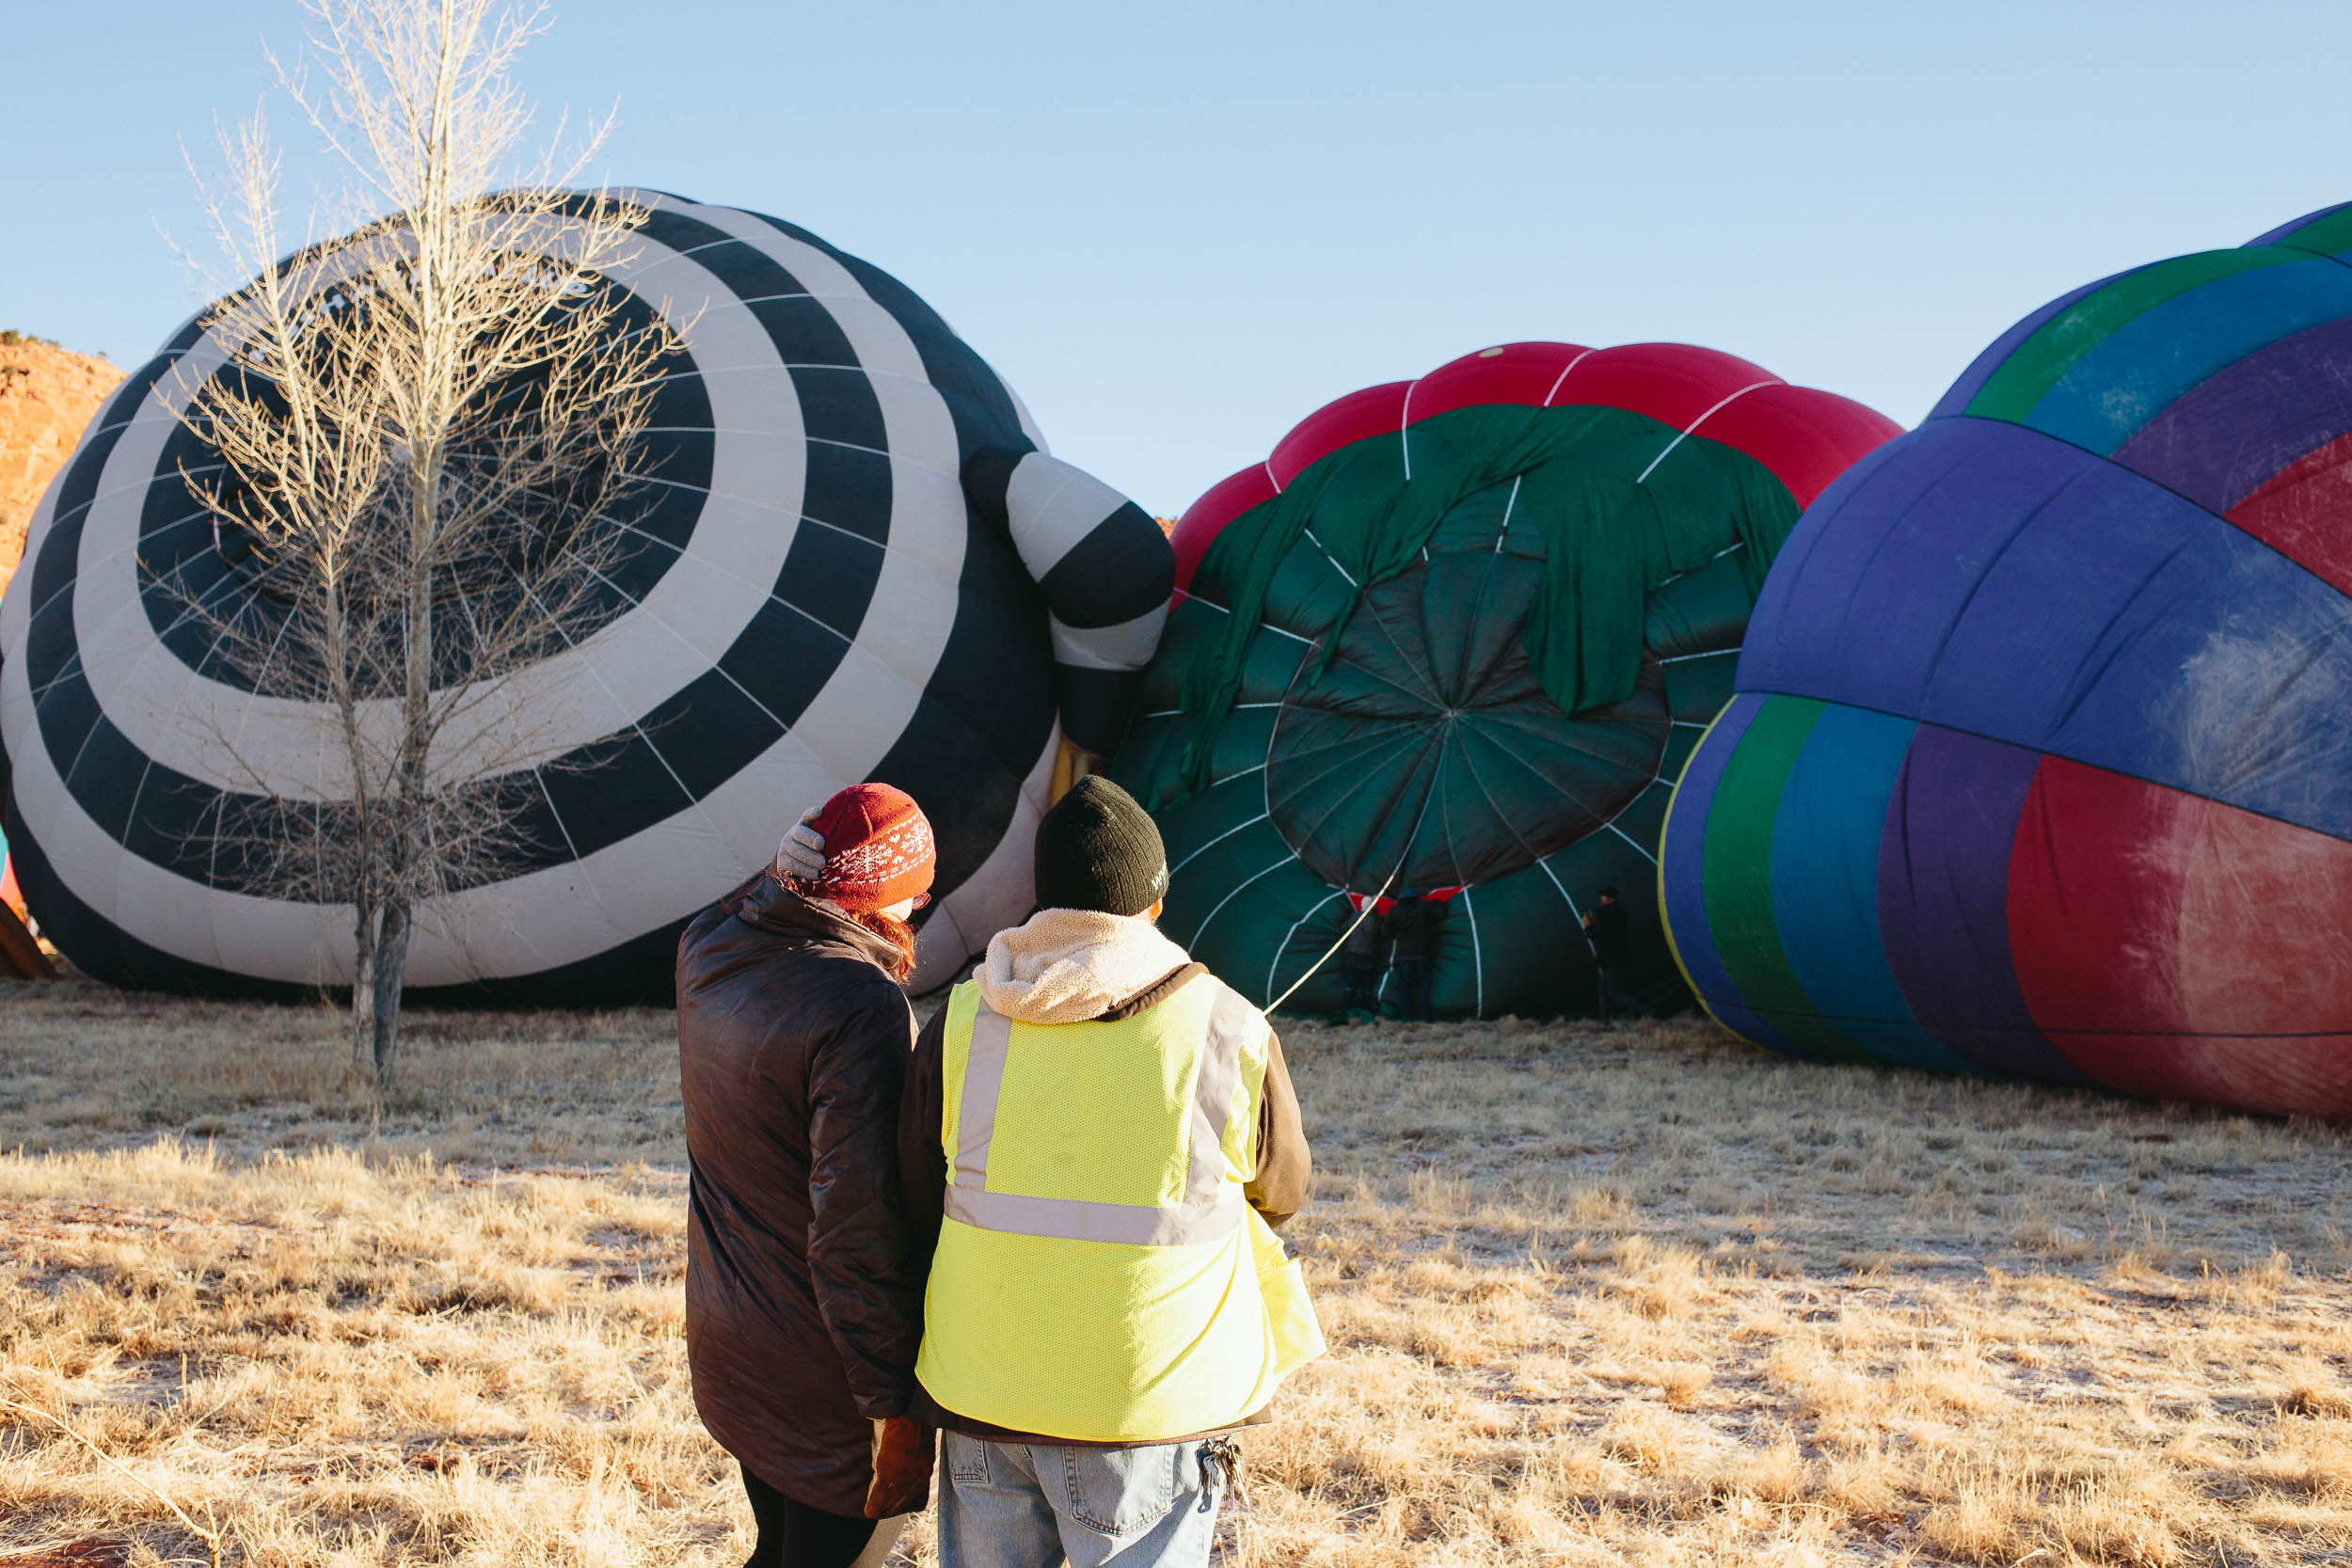 Kyle-Sheppard-Kanab-Balloon-Festival-4.jpg